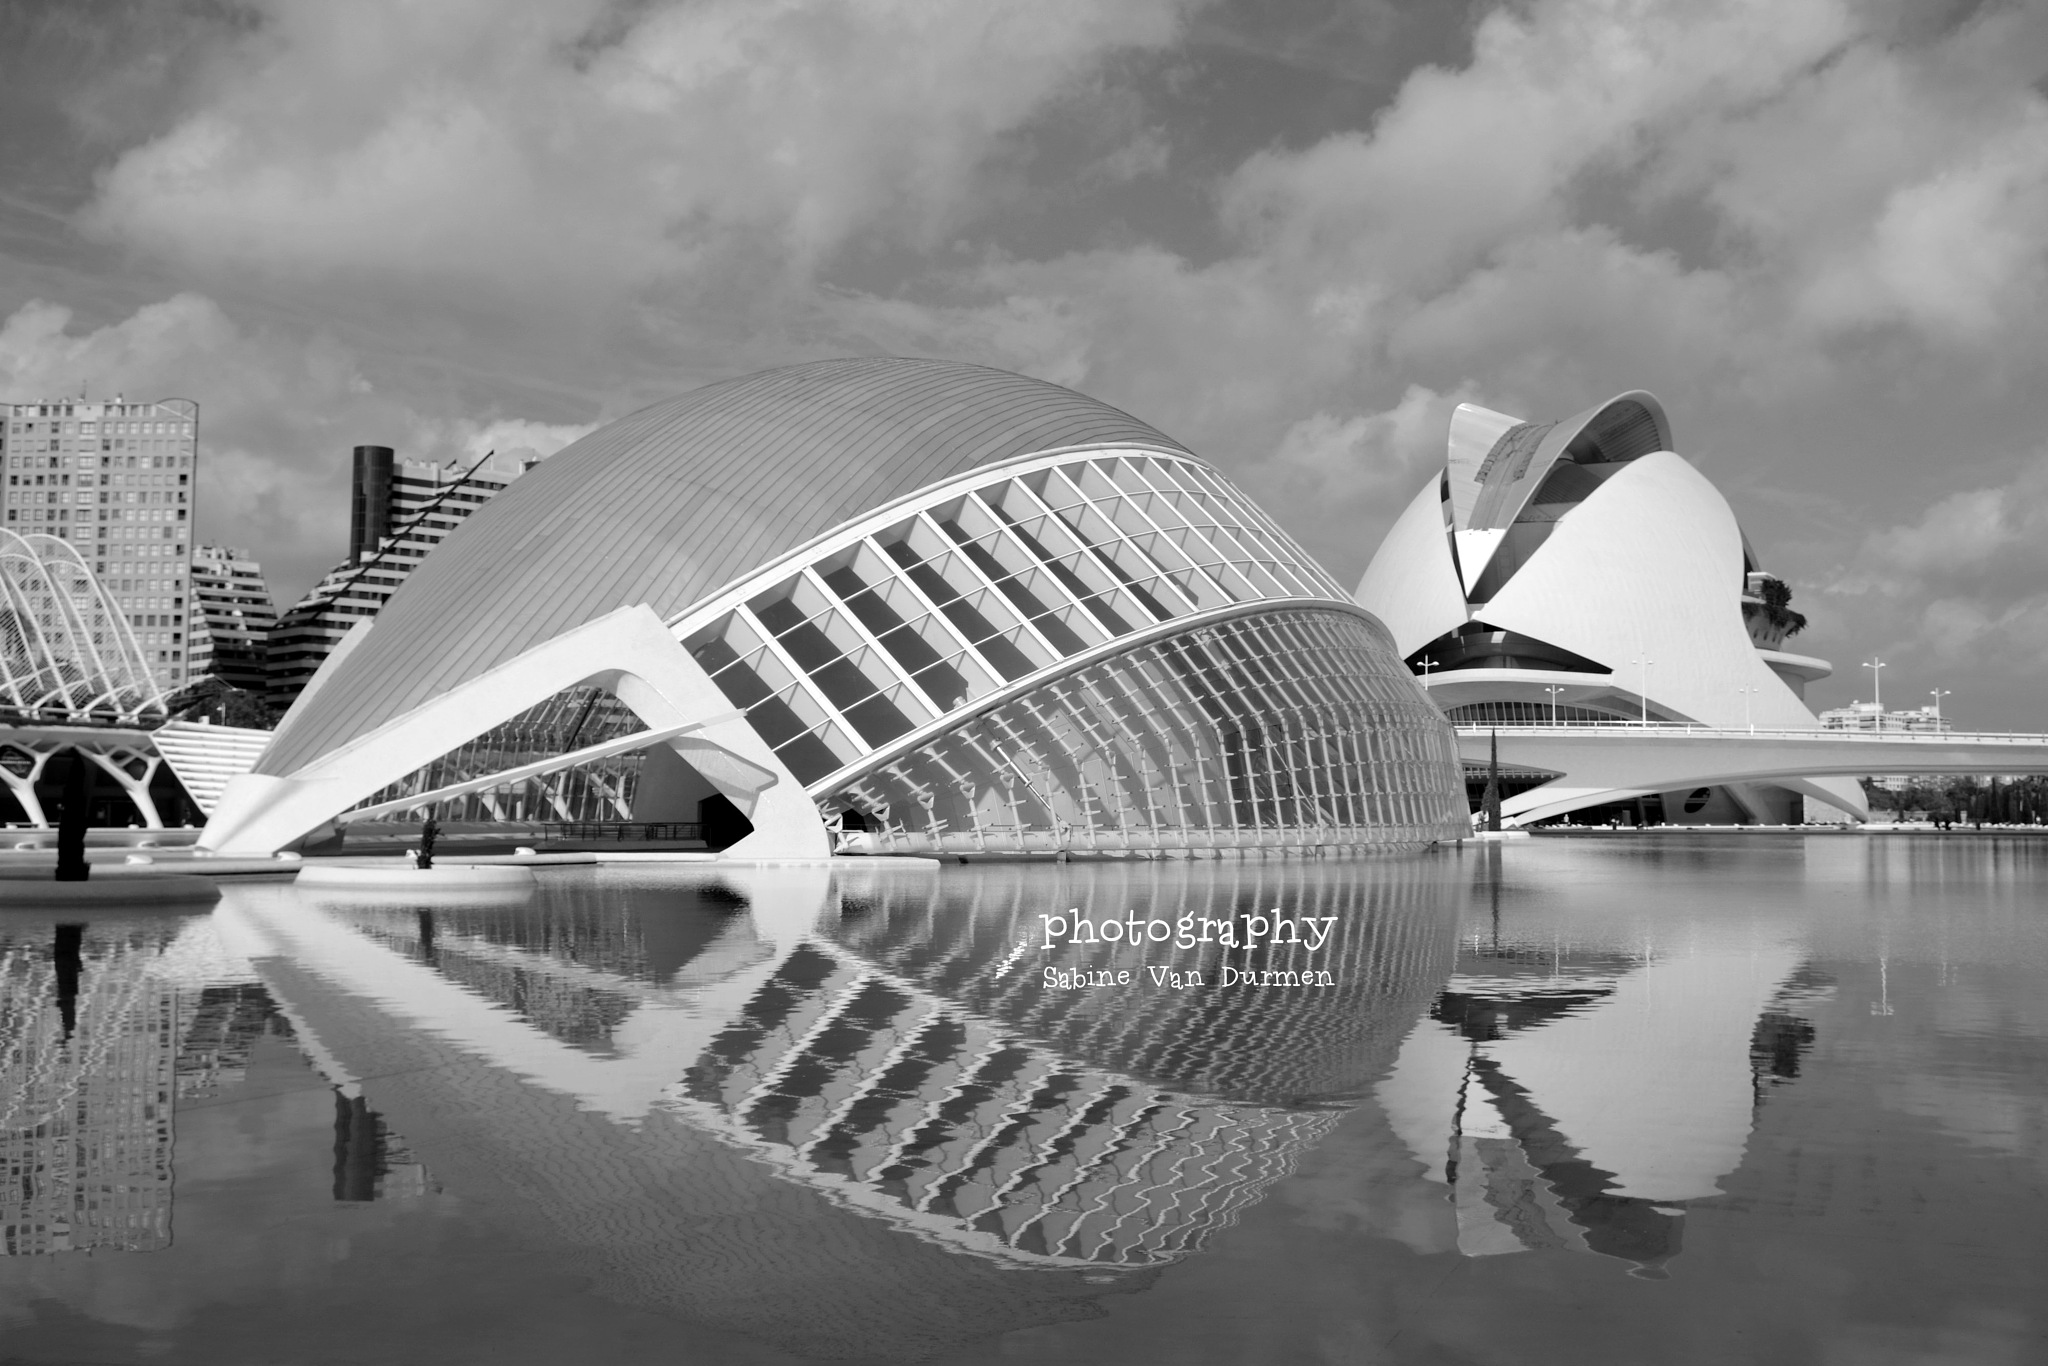 Valencia  by sabine.vandurmen